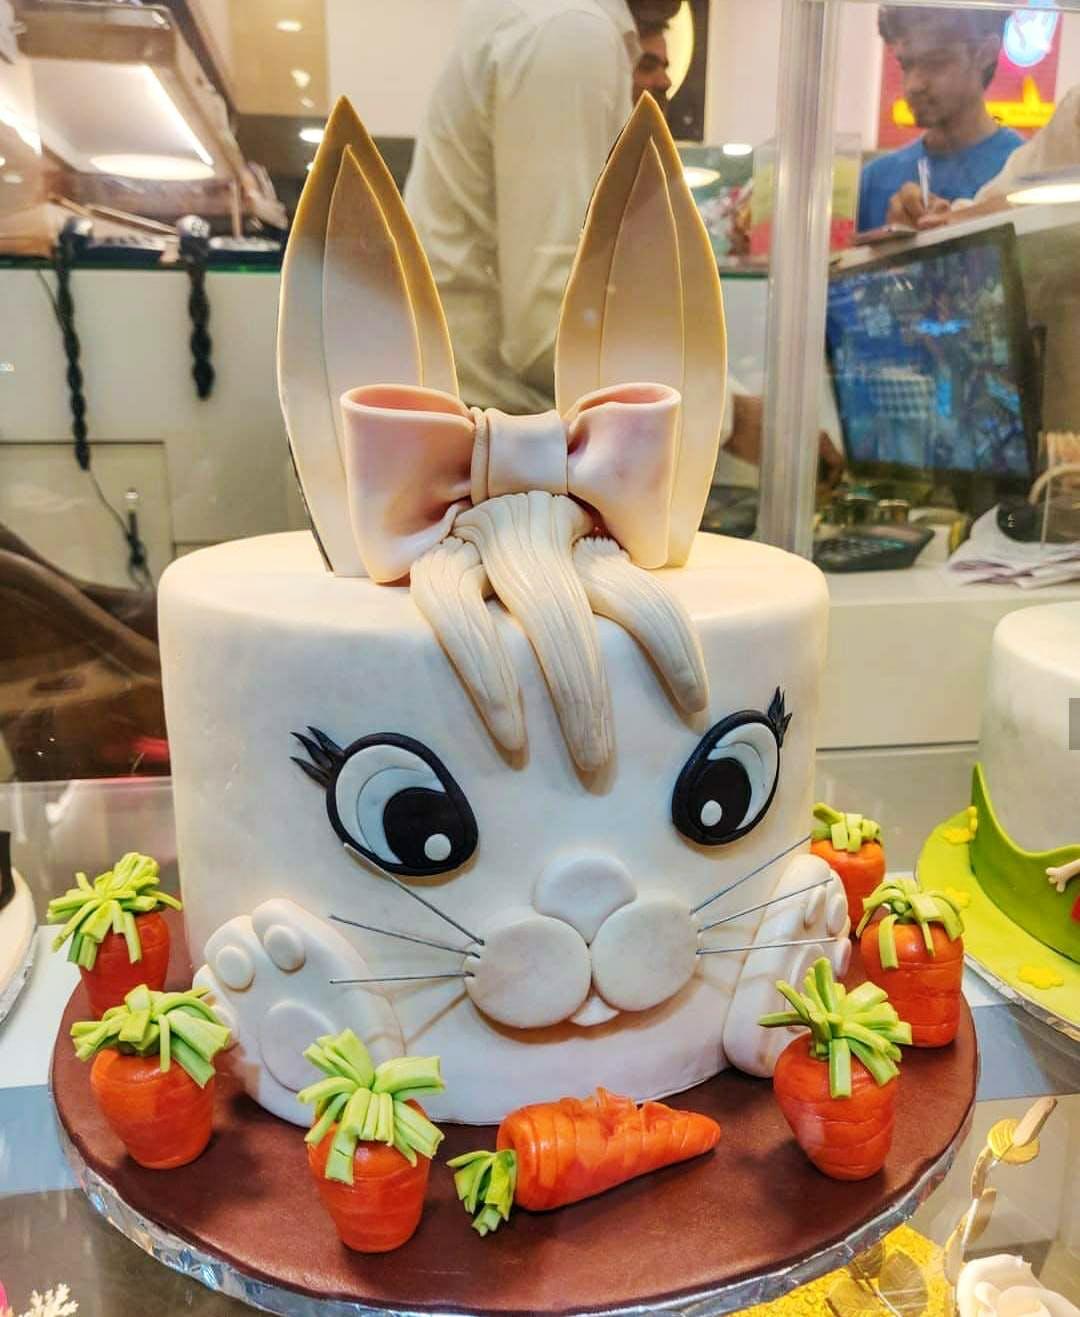 Cake decorating,Food,Cake,Sweetness,Sugar paste,Dessert,Culinary art,Birthday cake,Sugar cake,Cuisine